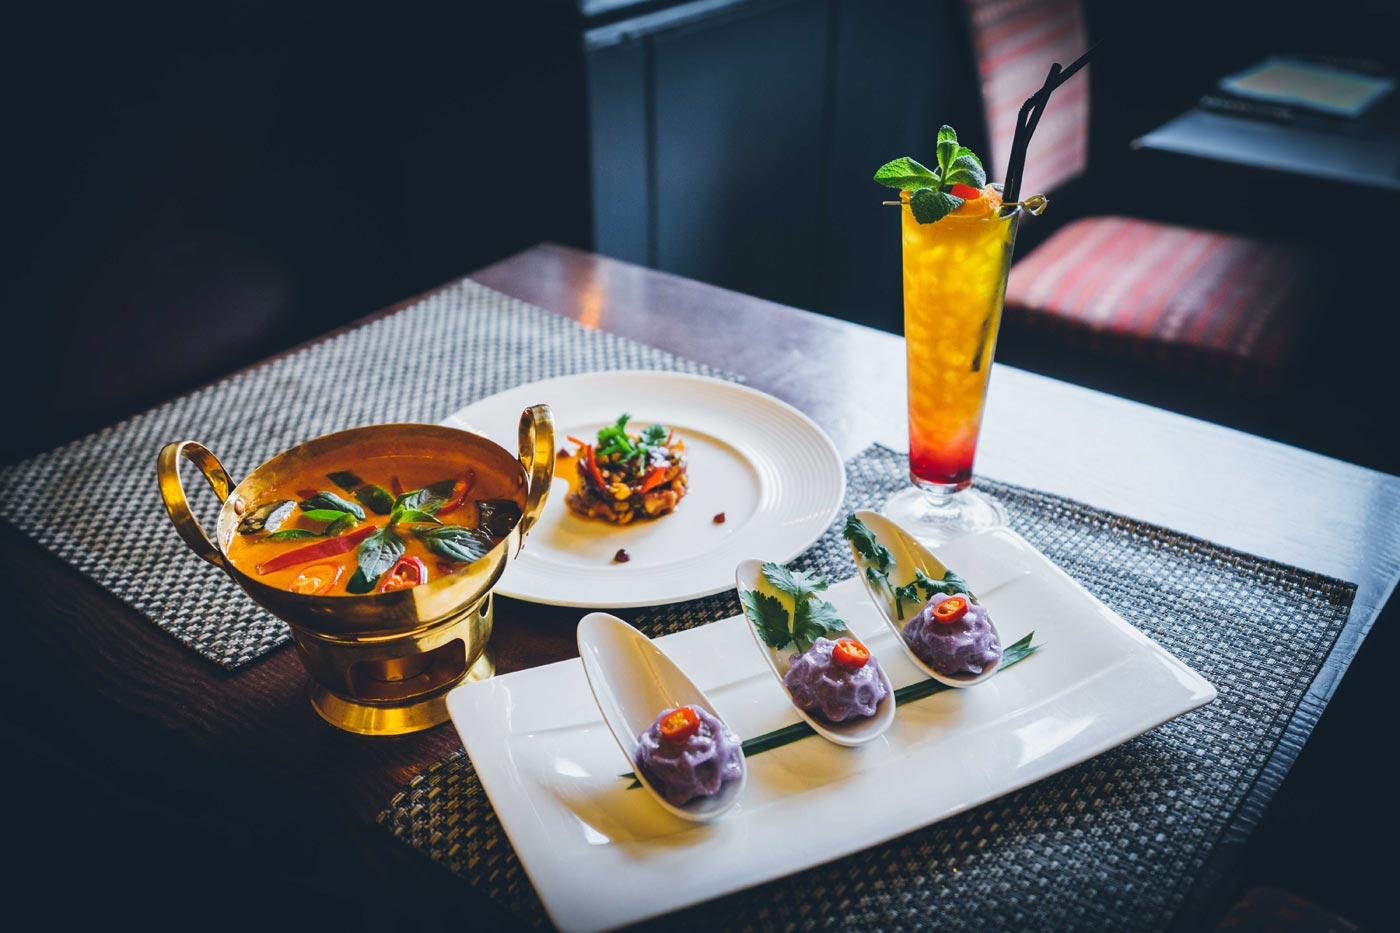 Passorn Thai Restaurant & Takeaway, Carryout, Tollcross Edinburgh, Scotland